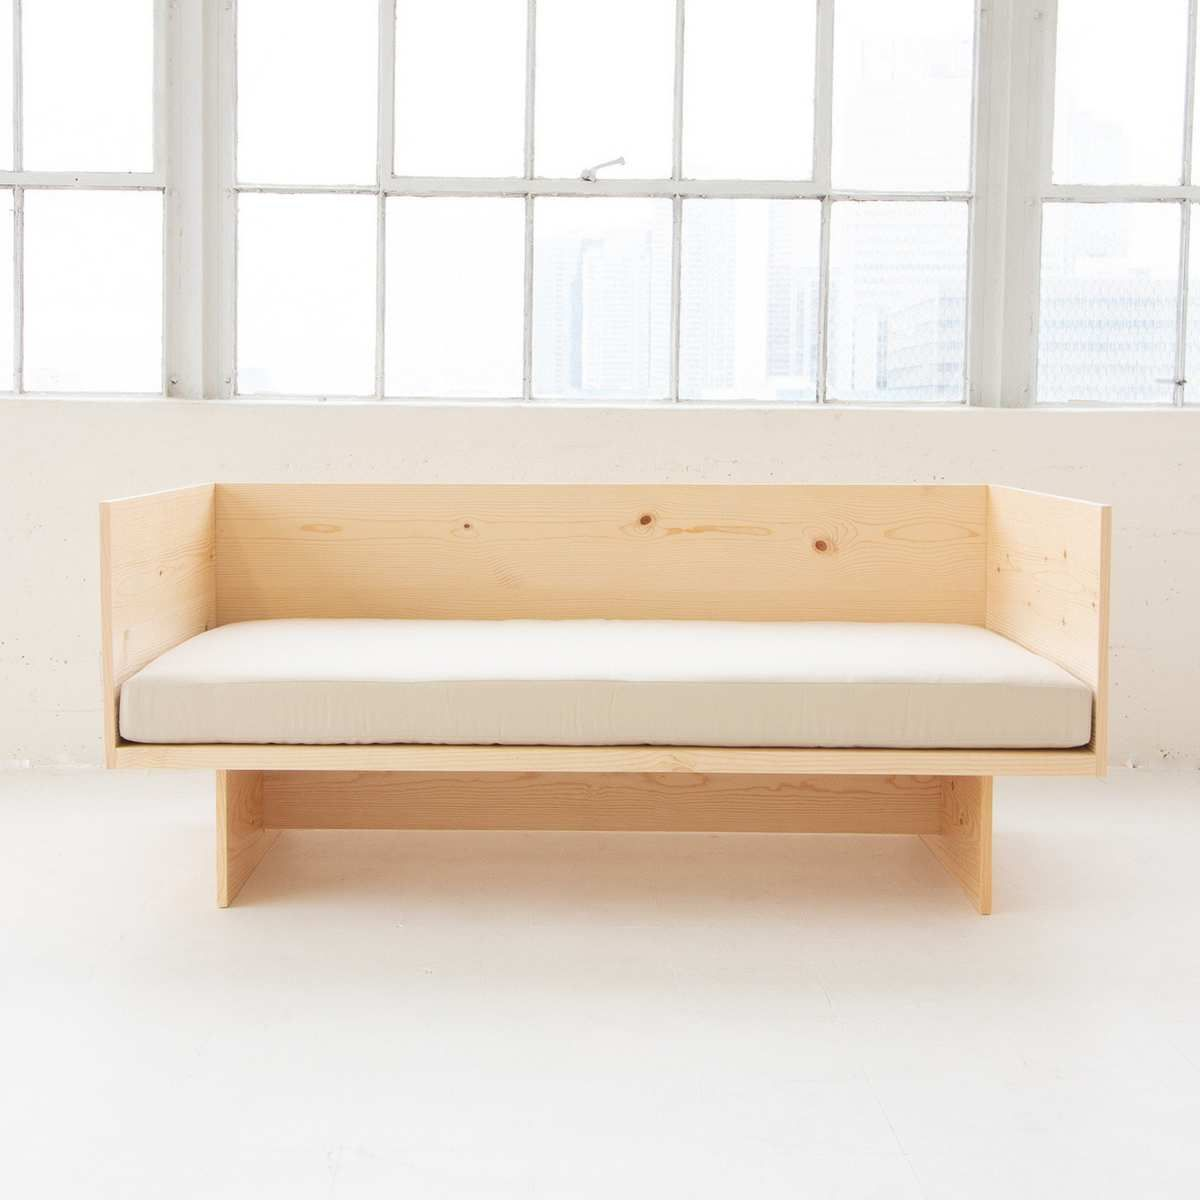 The Diy Donald Judd Furniture Guide Furniture Custom Cushions Wood Screws